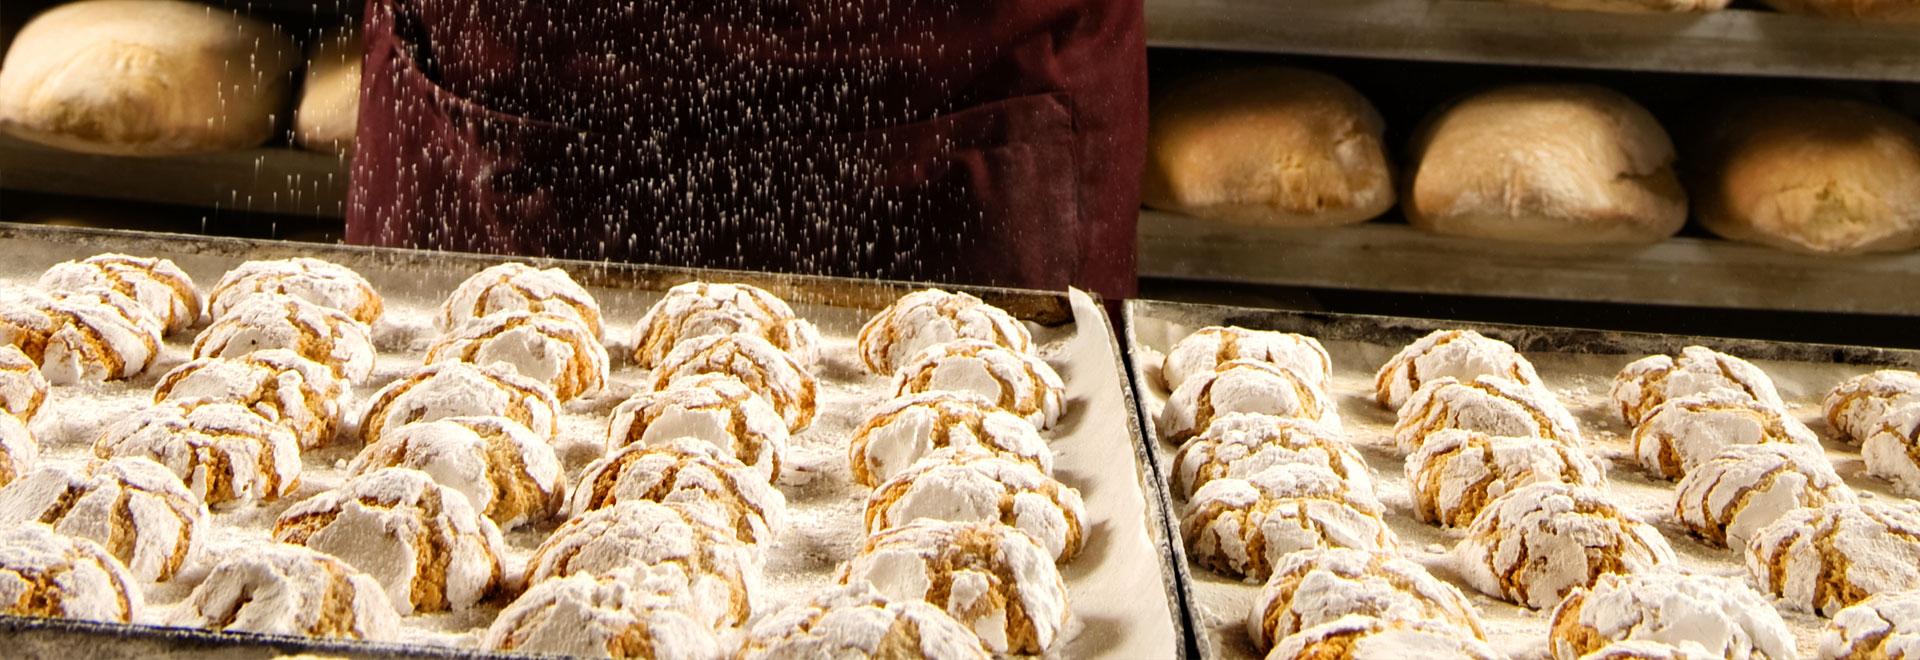 sienese sweets online shop il magnifico